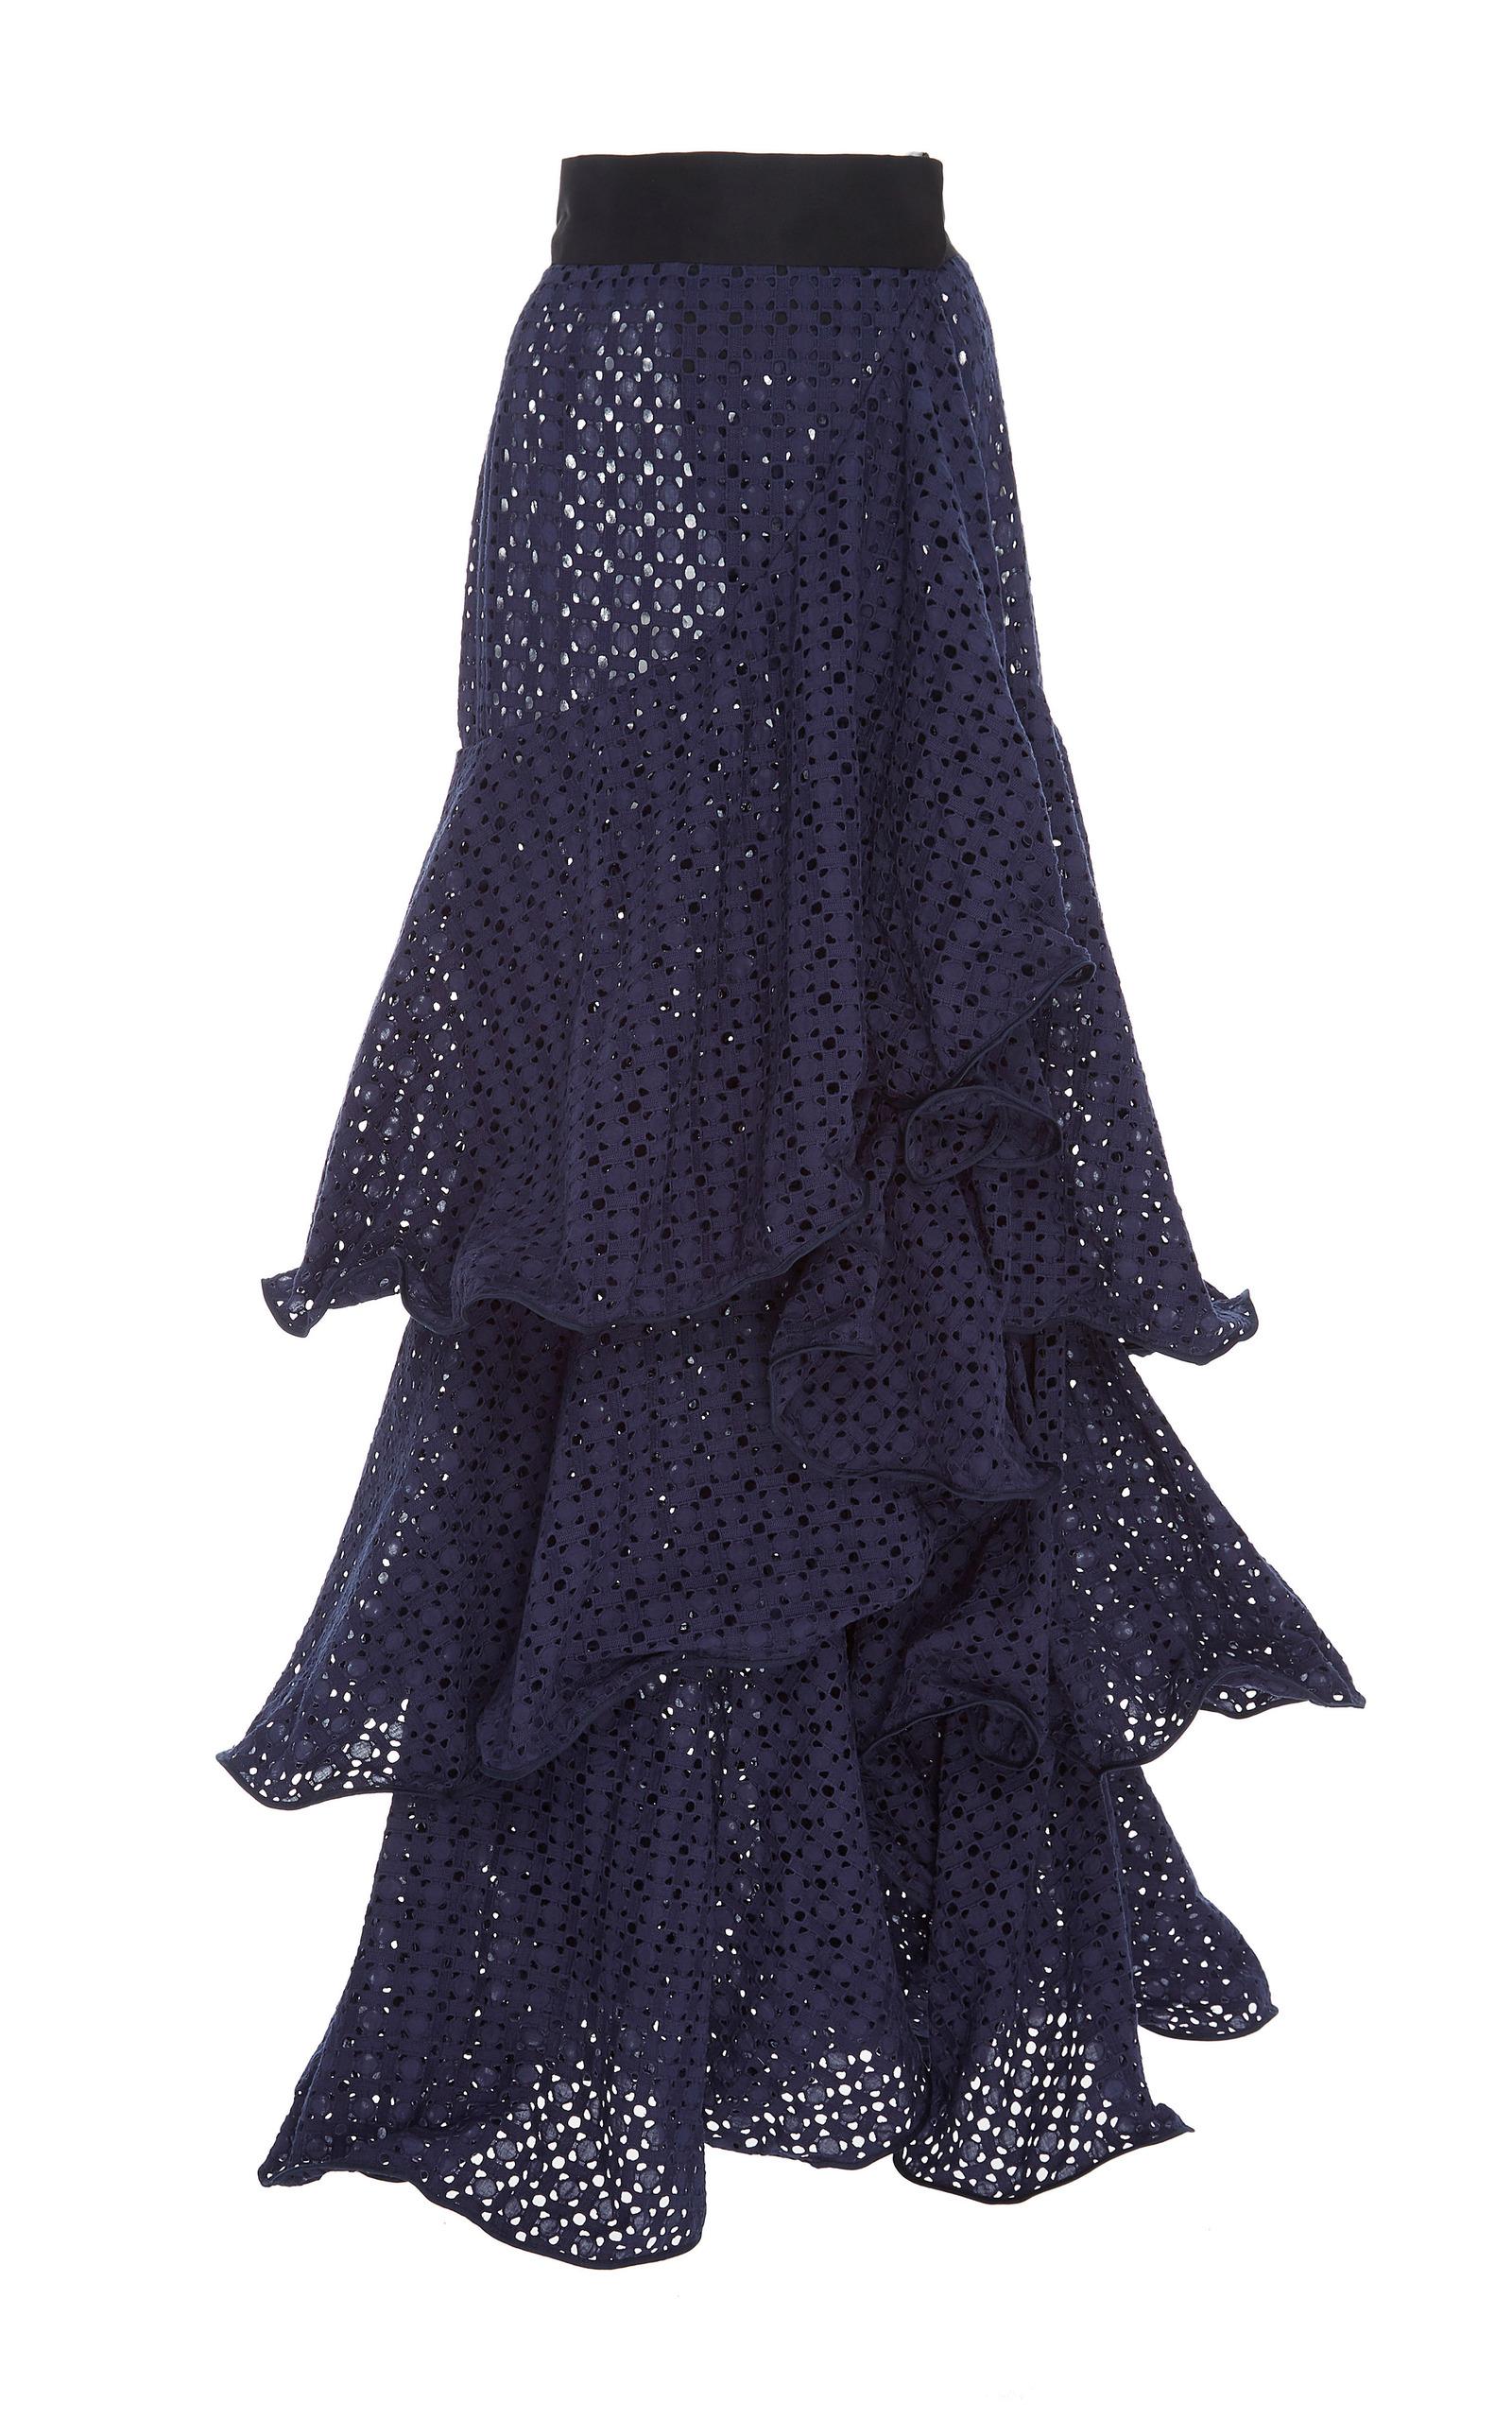 Johanna Belt Skirt Alexis For Cheap Online Buy For Sale CoZ7sDkU